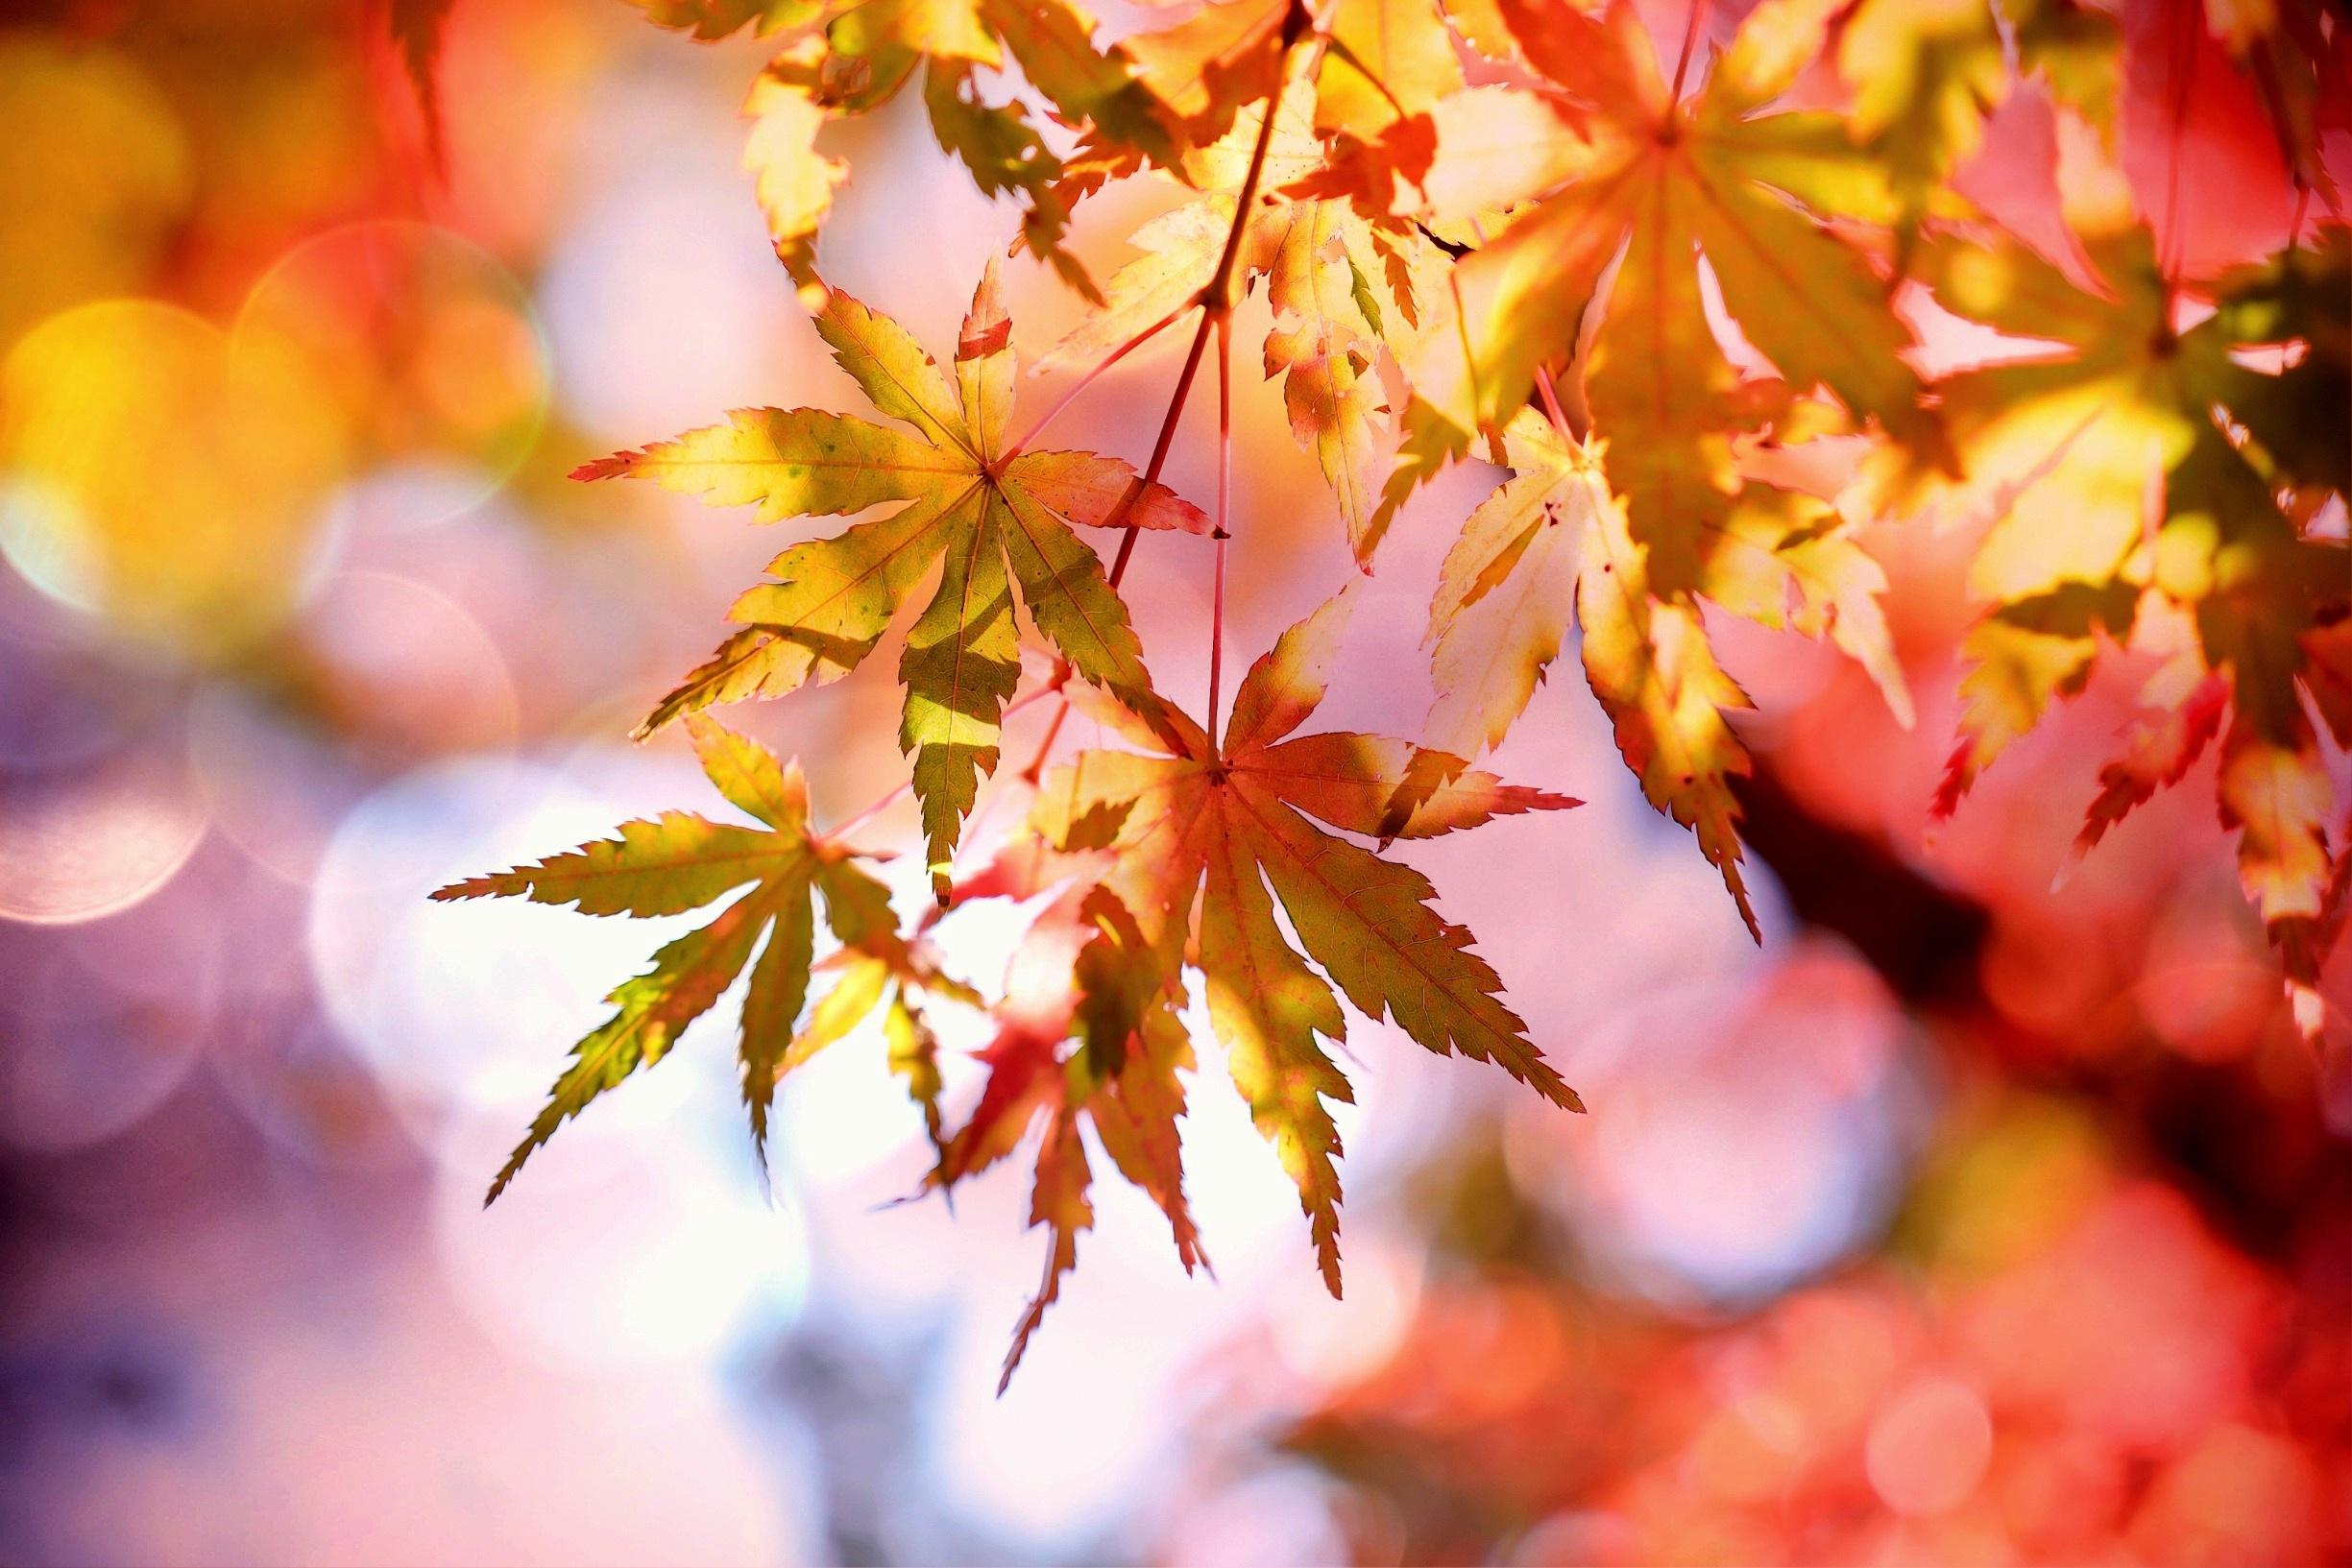 Iphone 6 Wallpaper Fall Leaves 1000 Beautiful Autumn Leaves Photos 183 Pexels 183 Free Stock